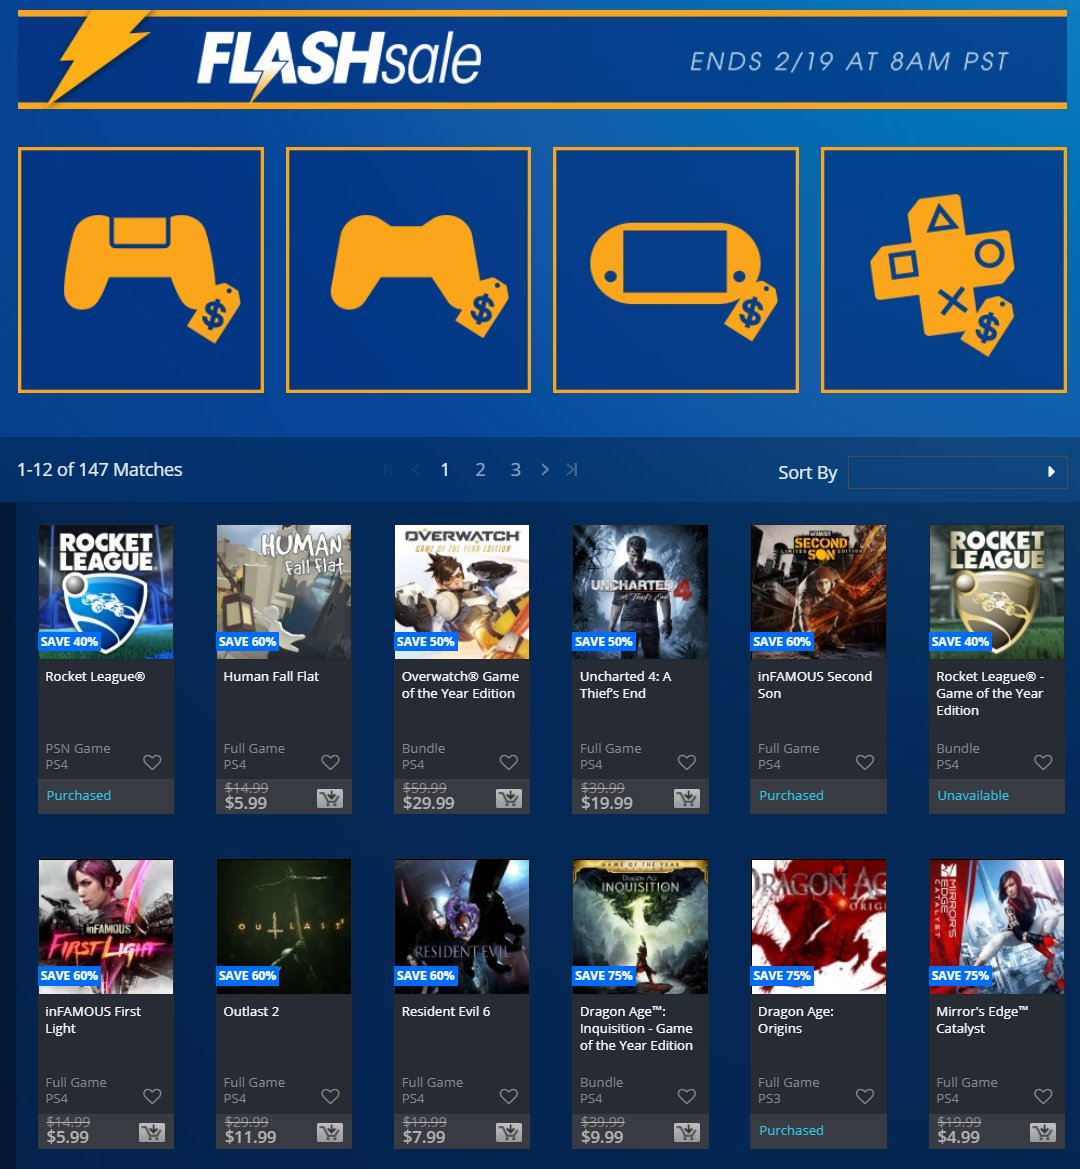 NA PSN has a Flash Sale! Dragon Age GOTY $10  https:// store.playstation.com/en-us/product/ UP0006-CUSA00220_00-DA3GAMEOFTHEYEAR  …  Cyberdimension Neptunia $20  https:// store.playstation.com/en-us/product/ UP0031-CUSA07960_00-CYONMEGAMIONLINE  …  FFXV $20  https:// store.playstation.com/en-us/product/ UP0082-CUSA01633_00-FINALFANTASYXV00  …  GrimGrimoire $2  https:// store.playstation.com/en-us/product/ UP9000-NPUD21604_00-0000000000000000  …  Mass Effect: Andromeda $13.19  https:// store.playstation.com/en-us/product/ UP0006-CUSA02684_00-ME4RECRUITDELUXE  …  More:  https:// store.playstation.com/en-us/grid/STO RE-MSF77008-FLASHSALE18LP/1  … <br>http://pic.twitter.com/OxKIM3F7eT